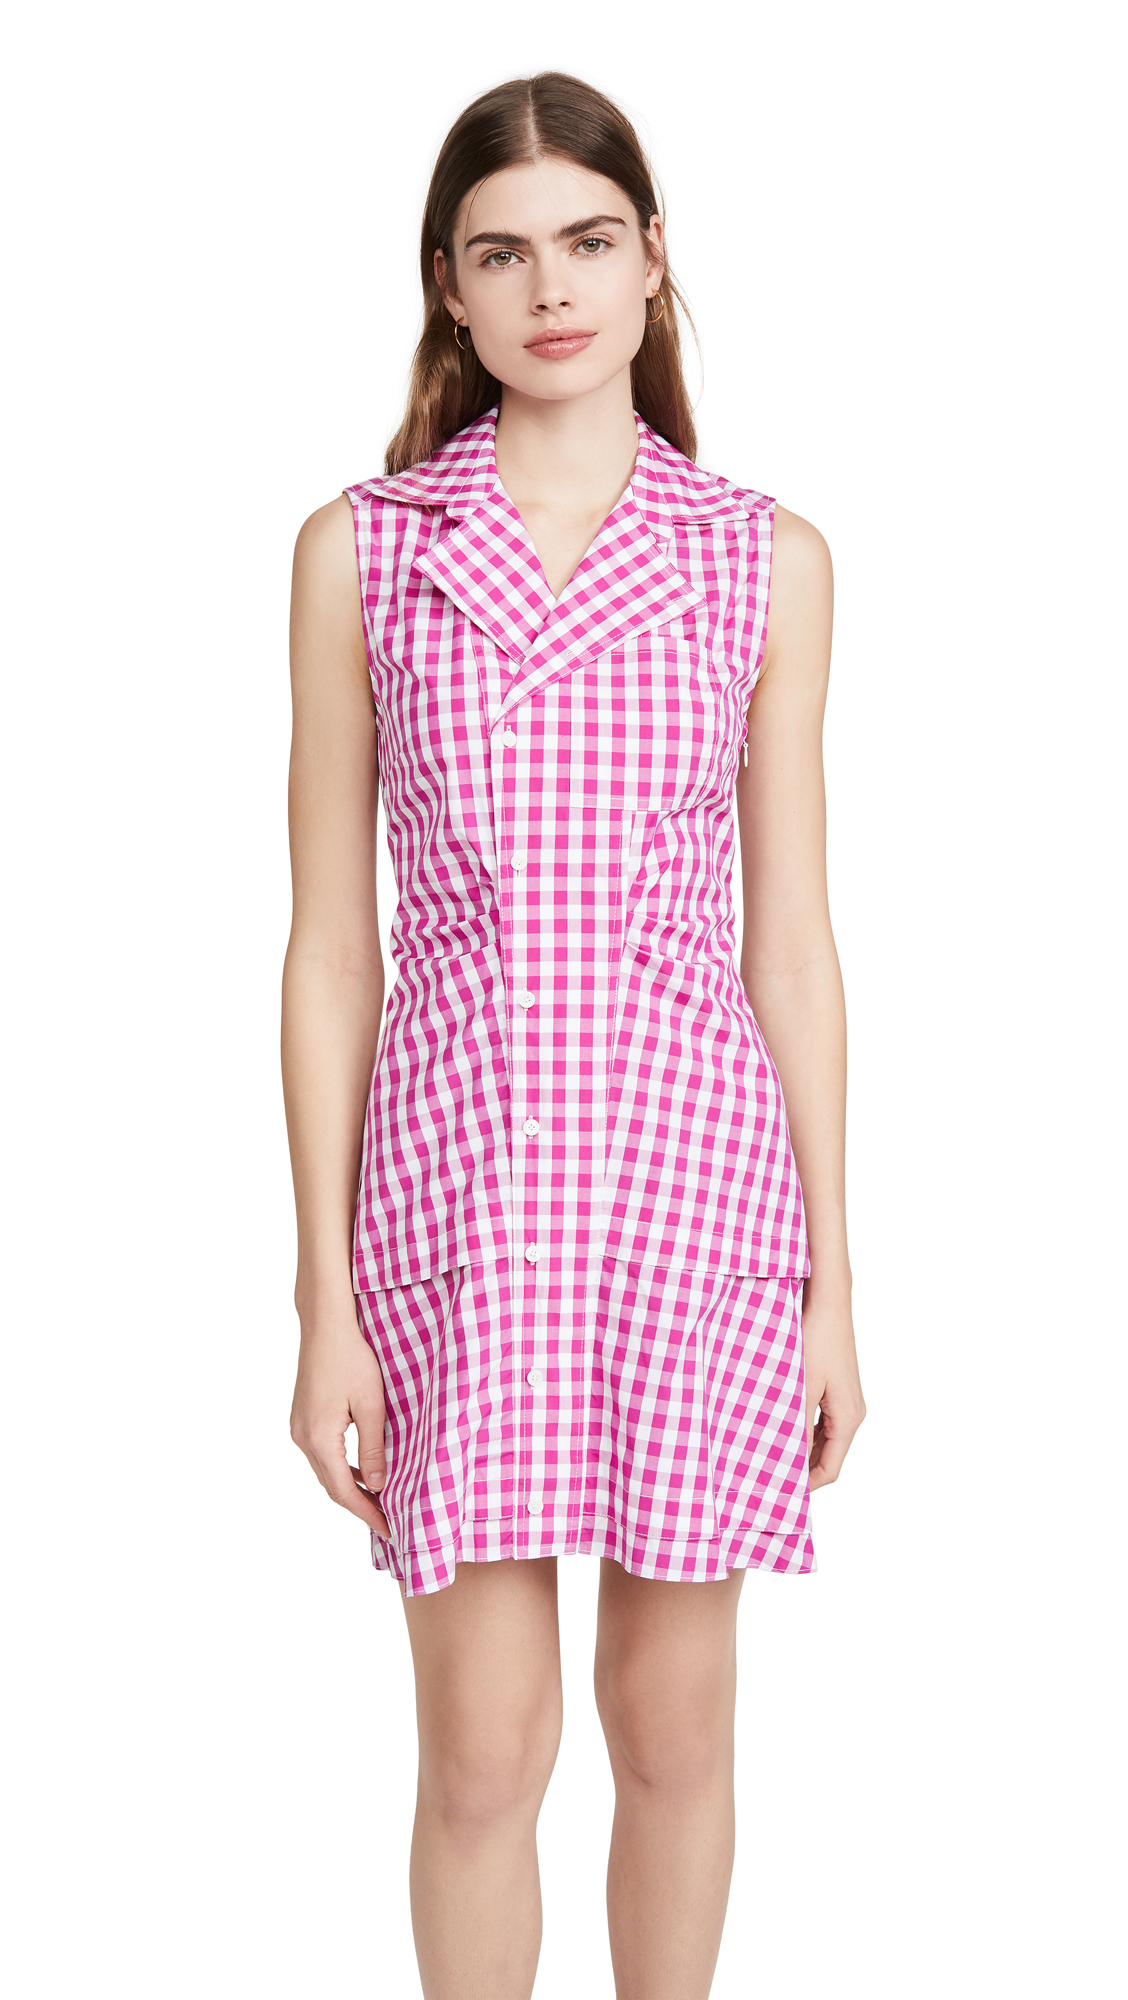 Derek Lam 10 Crosby Satina Sleeveless Shirt Dress